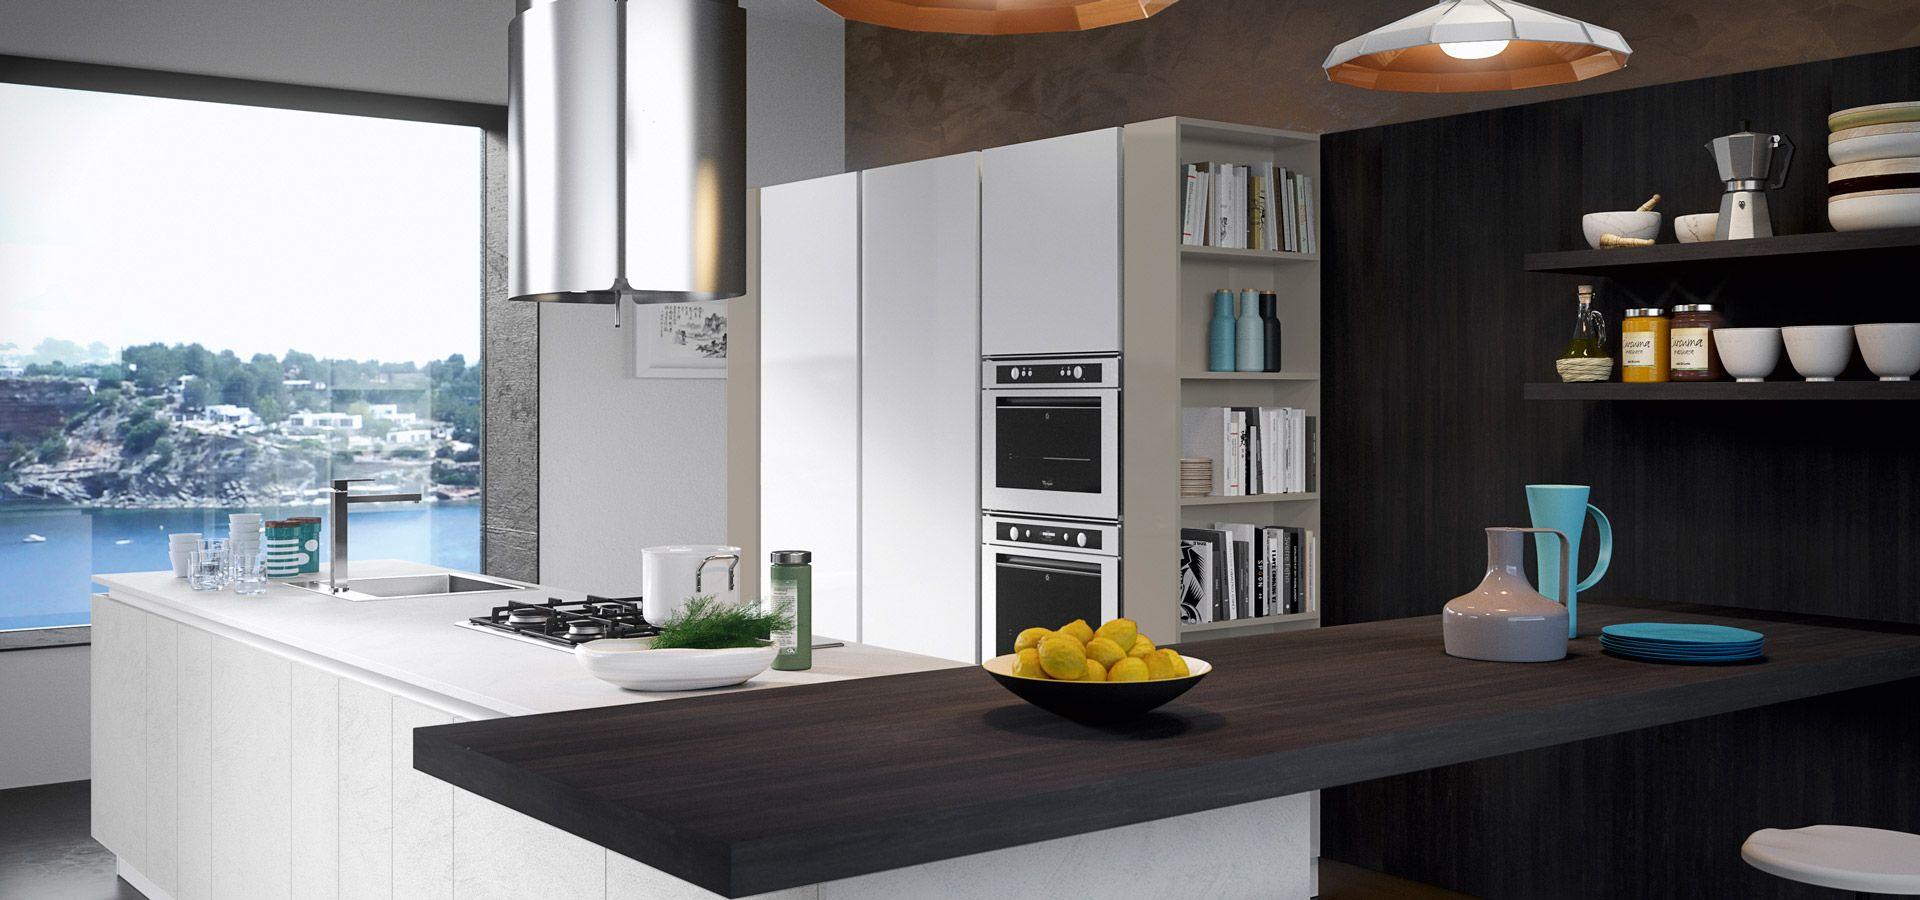 Cucina moderna kali cucine moderne - Cucine arredo 3 ...